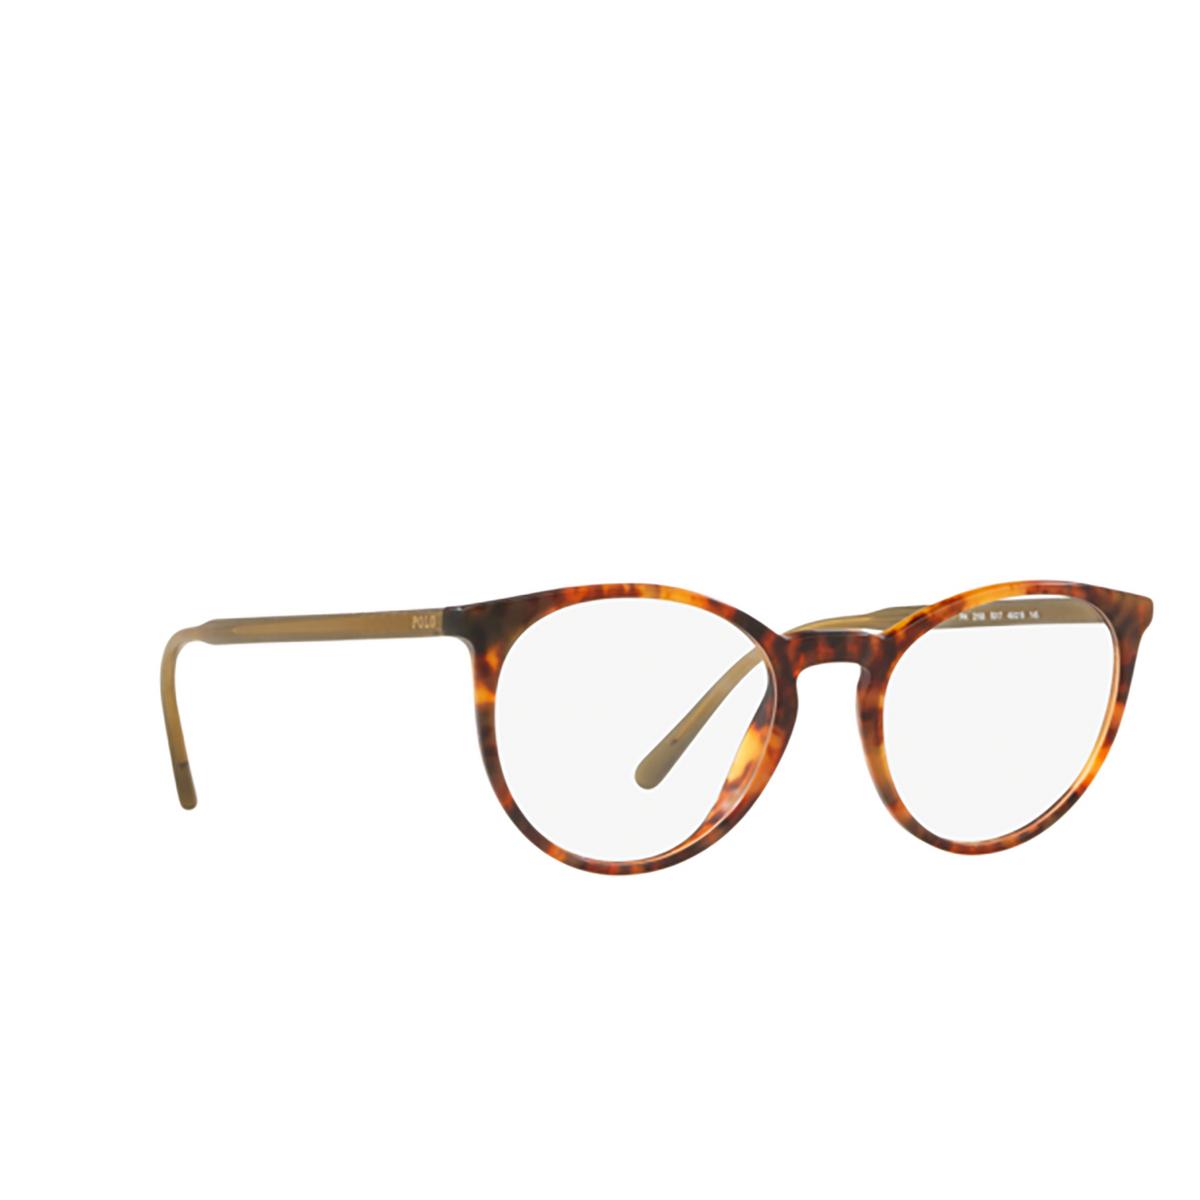 Polo Ralph Lauren® Round Eyeglasses: PH2193 color 5017 - three-quarters view.